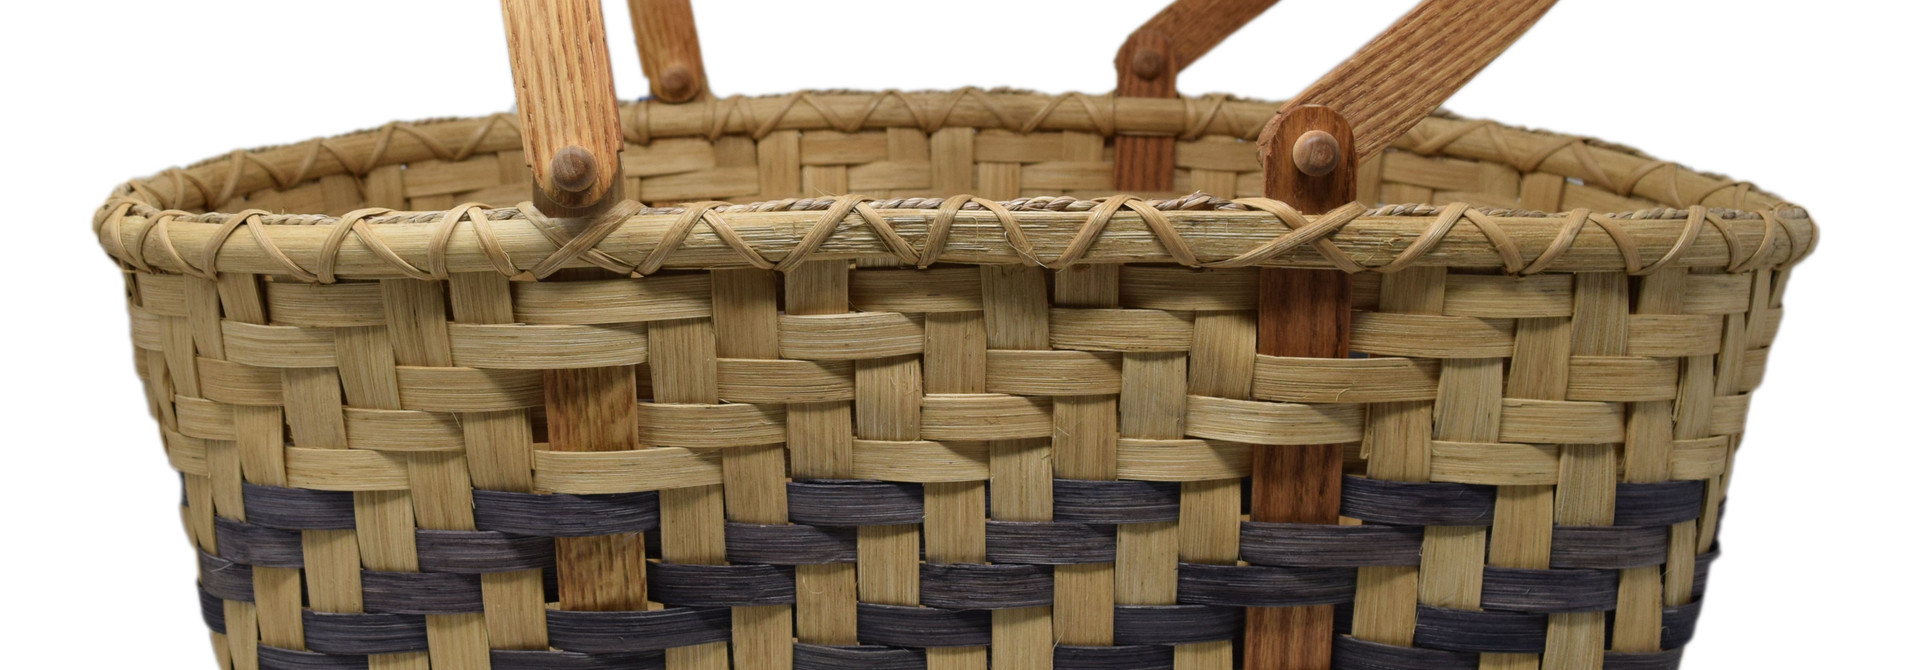 Family Picnic Basket